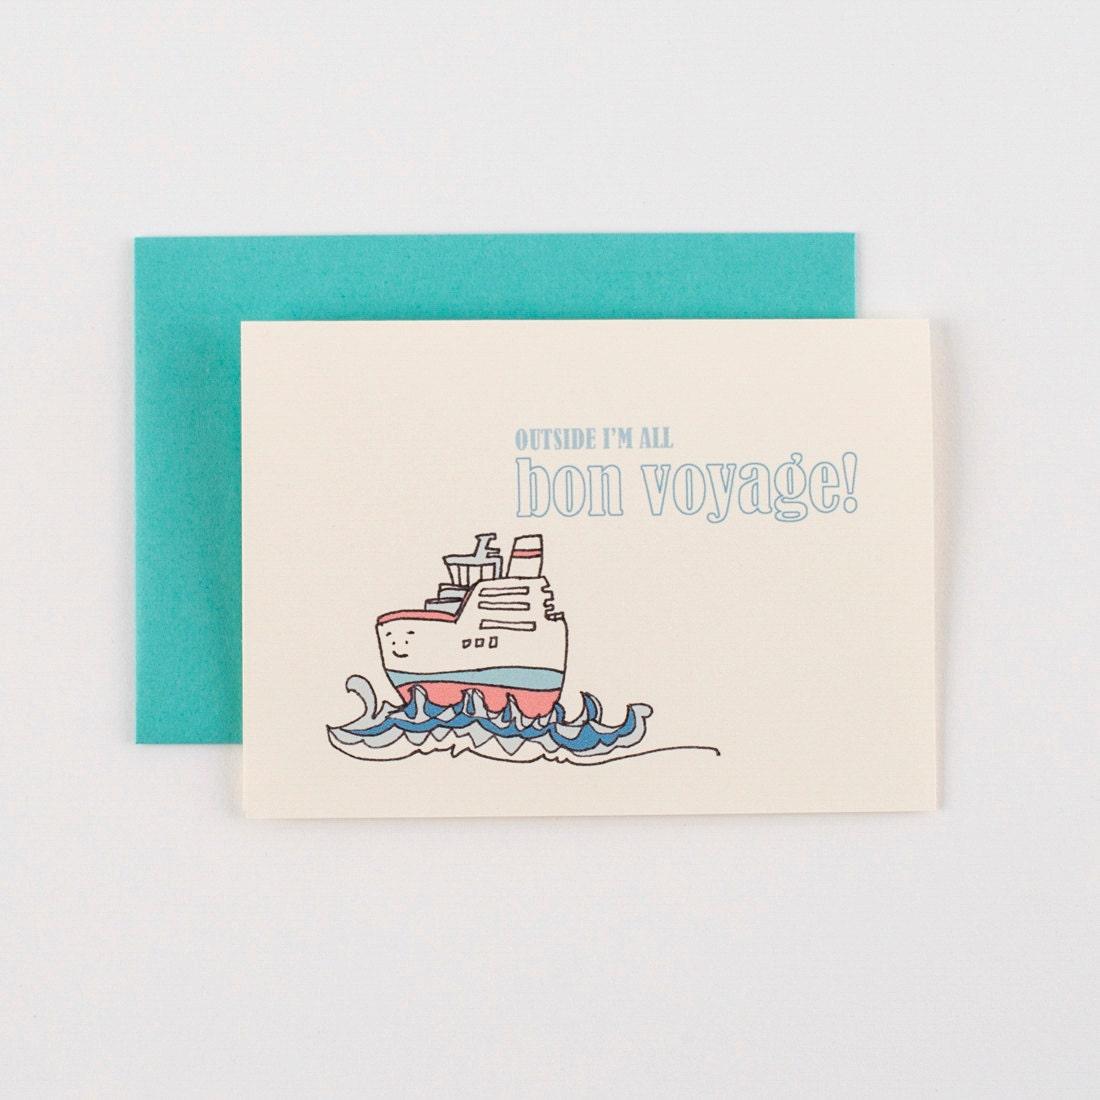 Tugboat bon voyage greeting card description bon voyage m4hsunfo